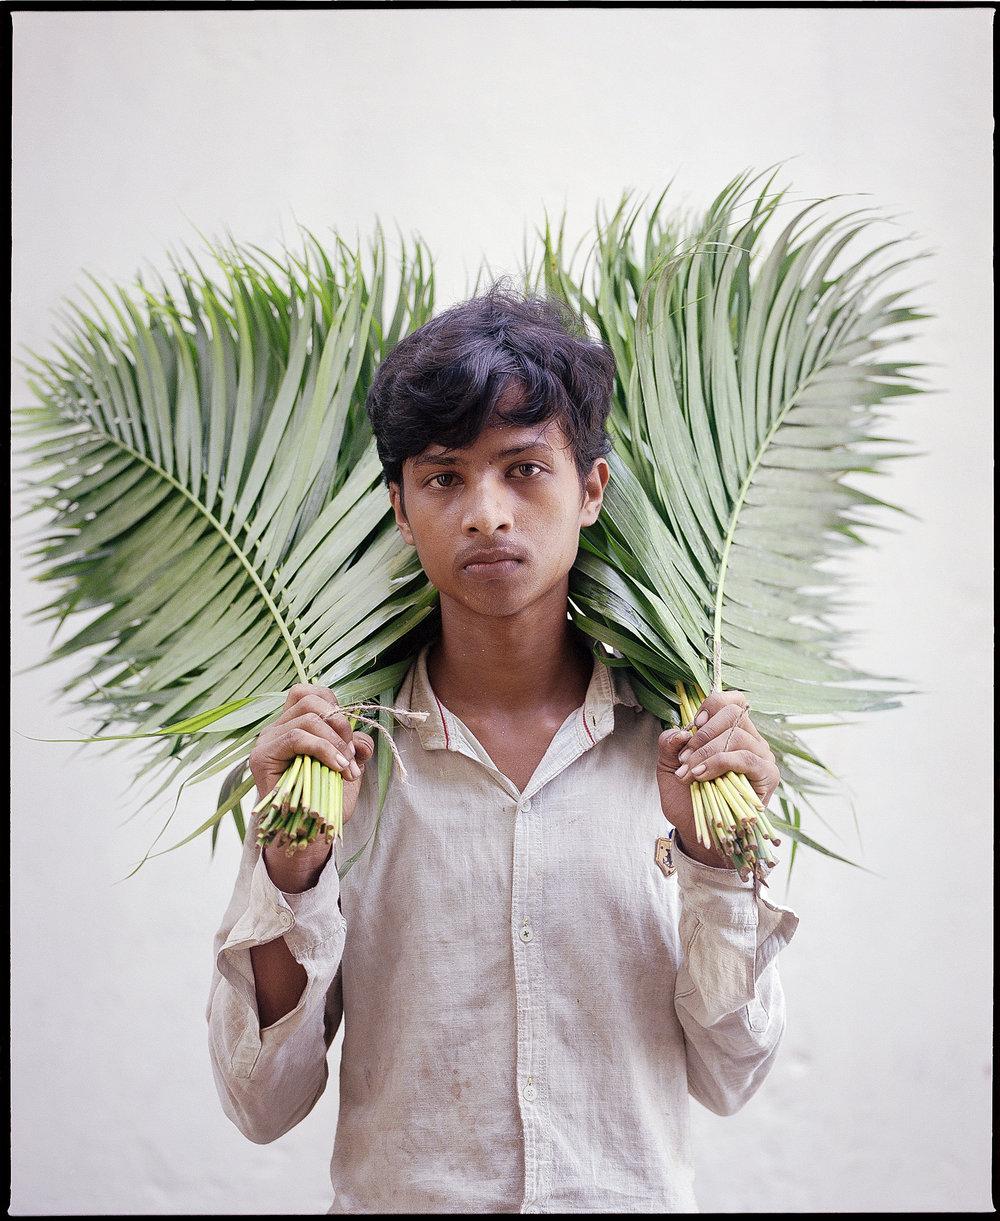 Kolkata_Flowers-3.jpg